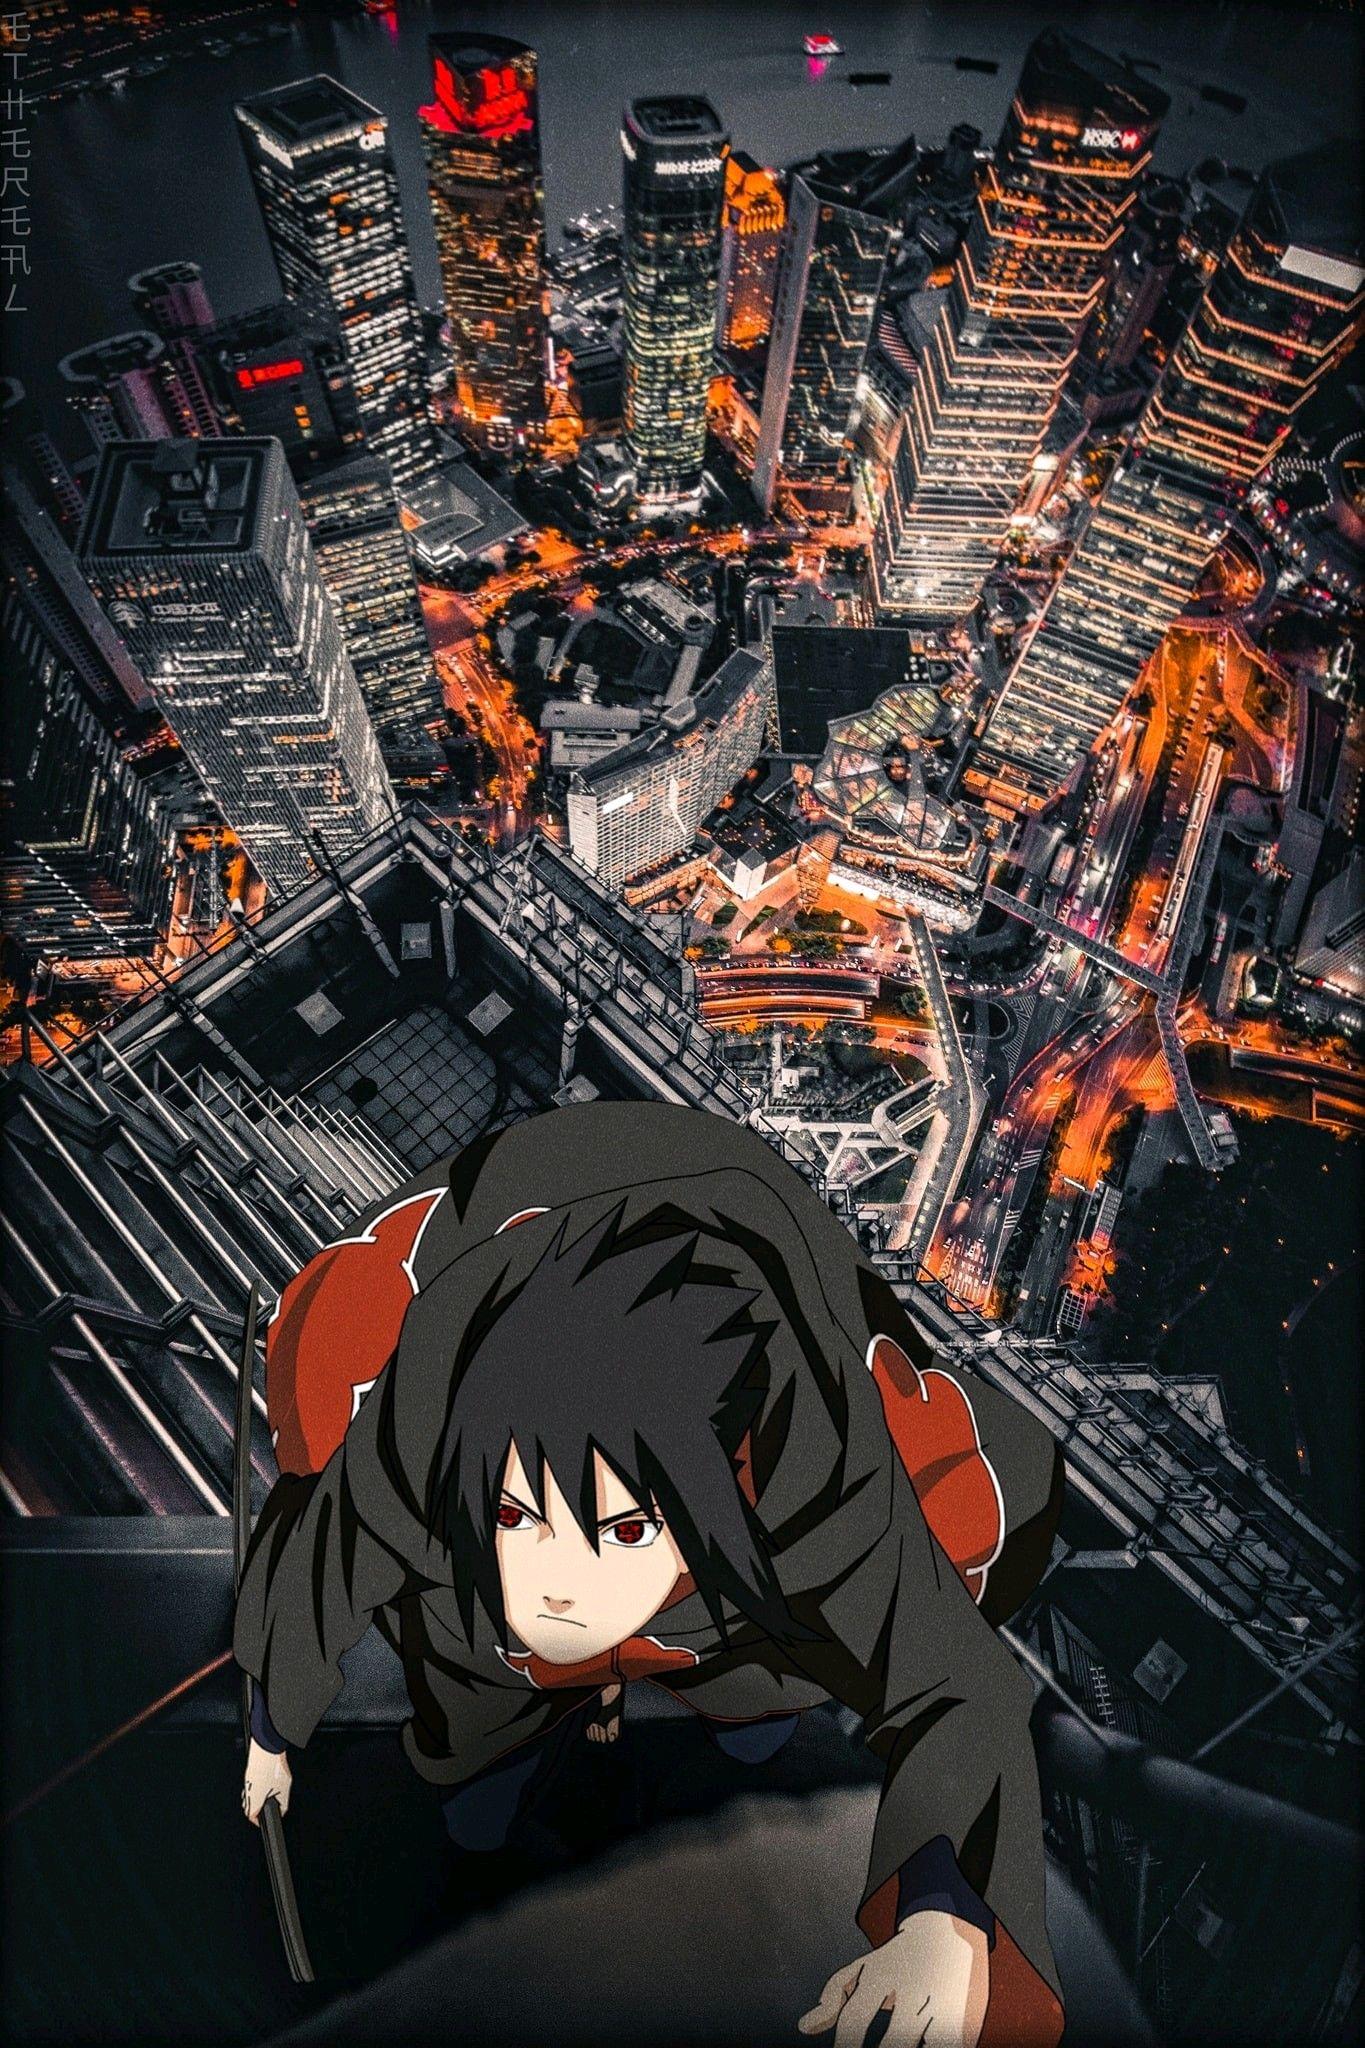 Pin by Yin Yang on Anime Real... Anime, Art, Naruto